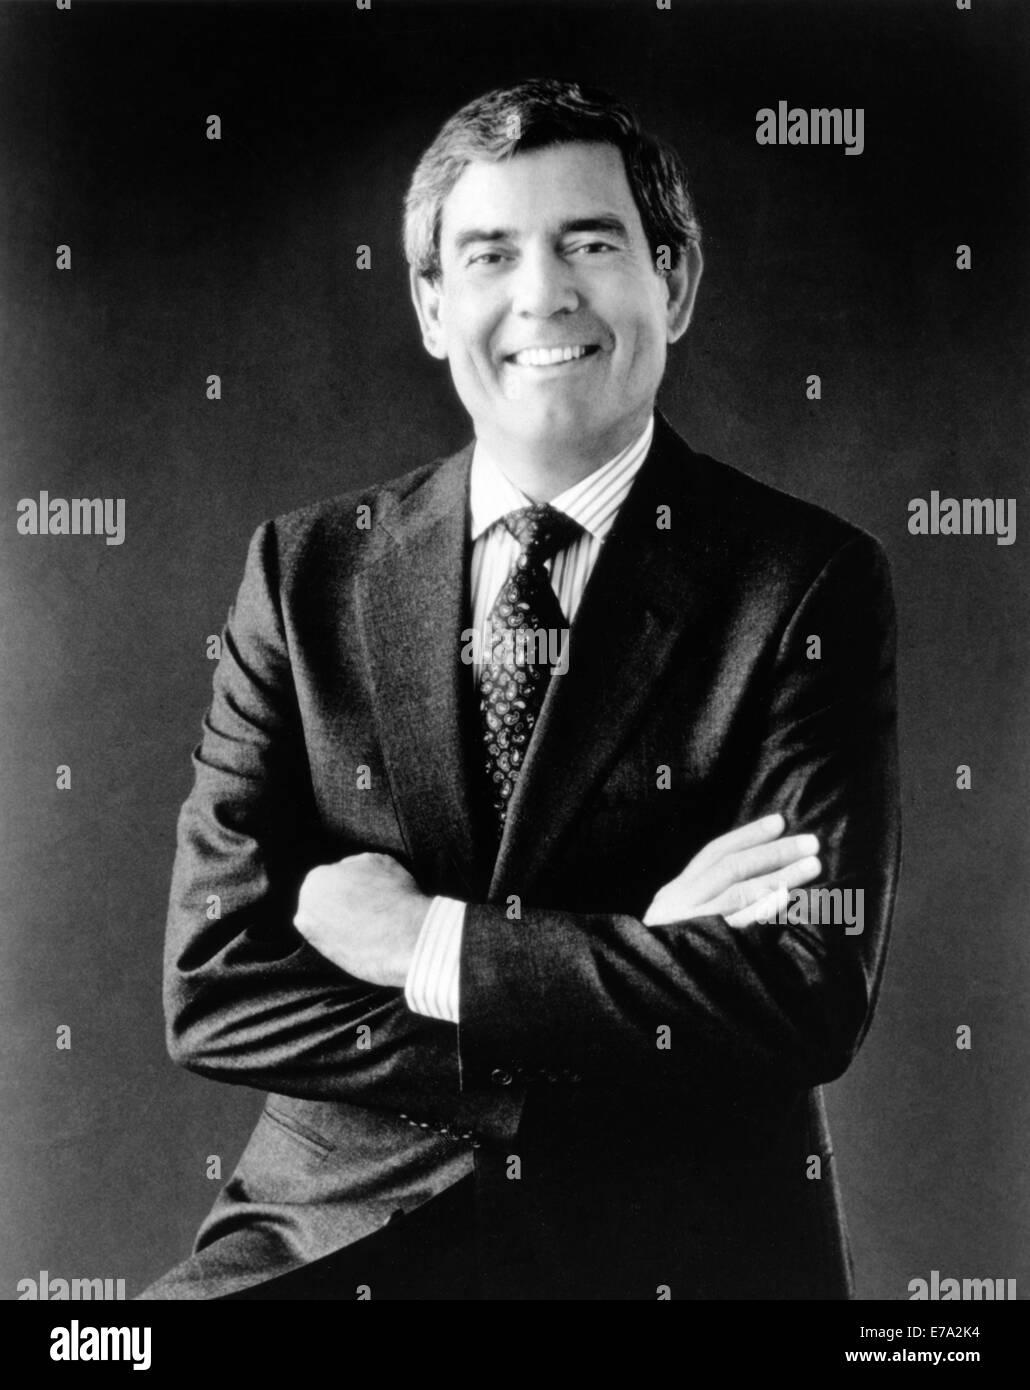 Dan Rather, American Broadcast Journalist, Portrait, circa early 1980's - Stock Image